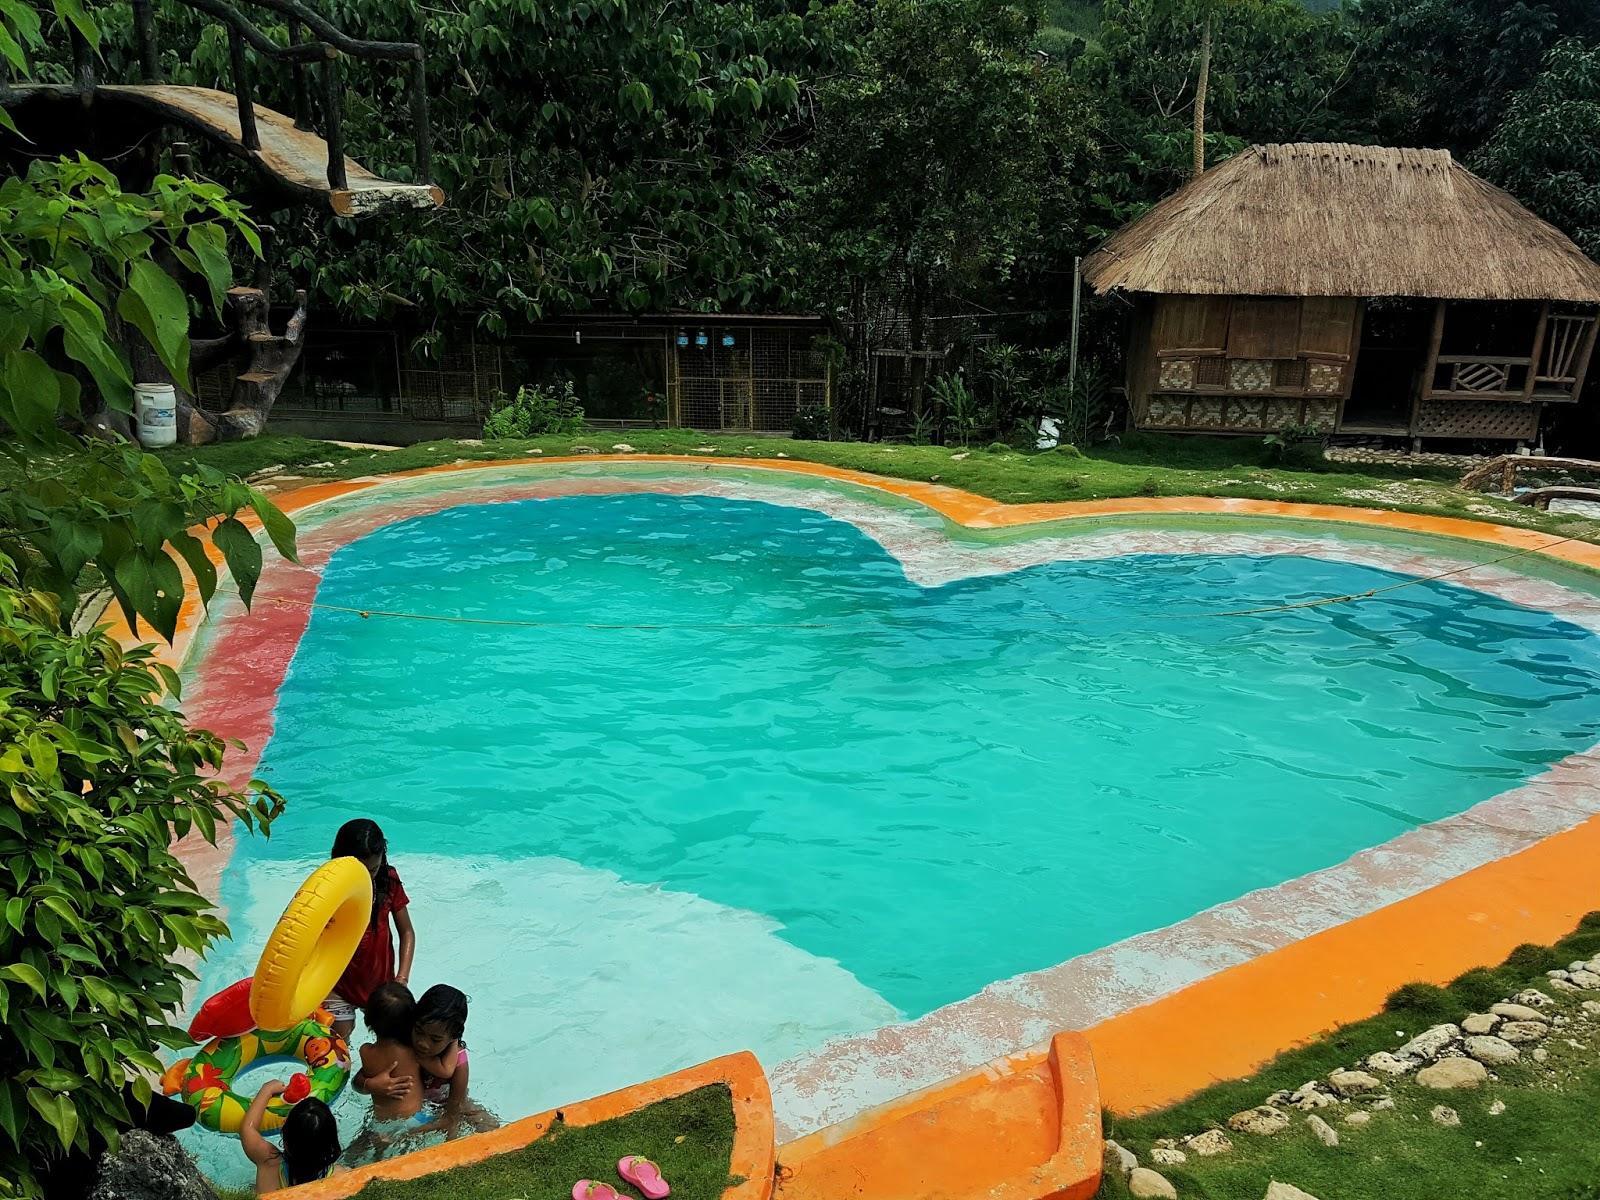 Good 7 Feet Heart Shaped Pool At Coal Mountain Resort   Argao, Cebu Awesome Design